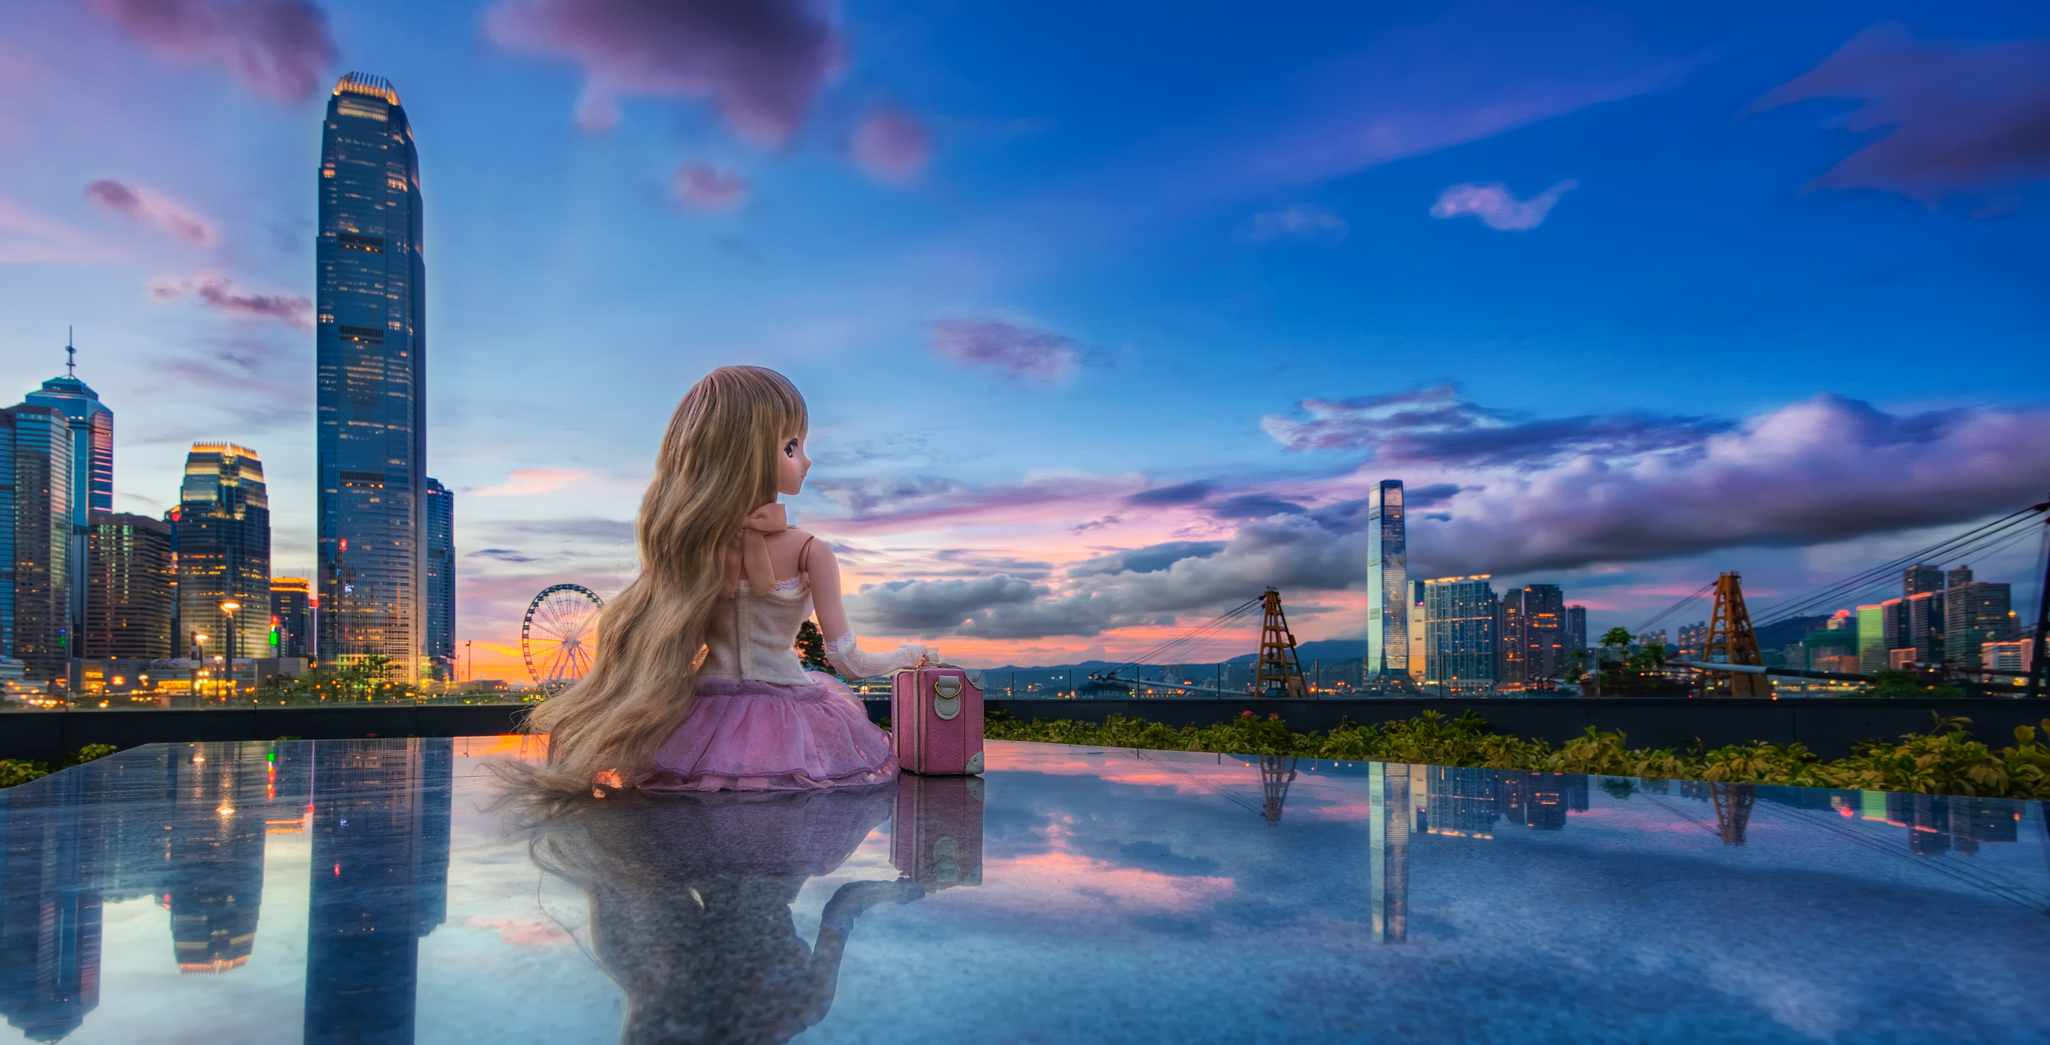 Una muñeca frente a una ciudad - 2050x1045